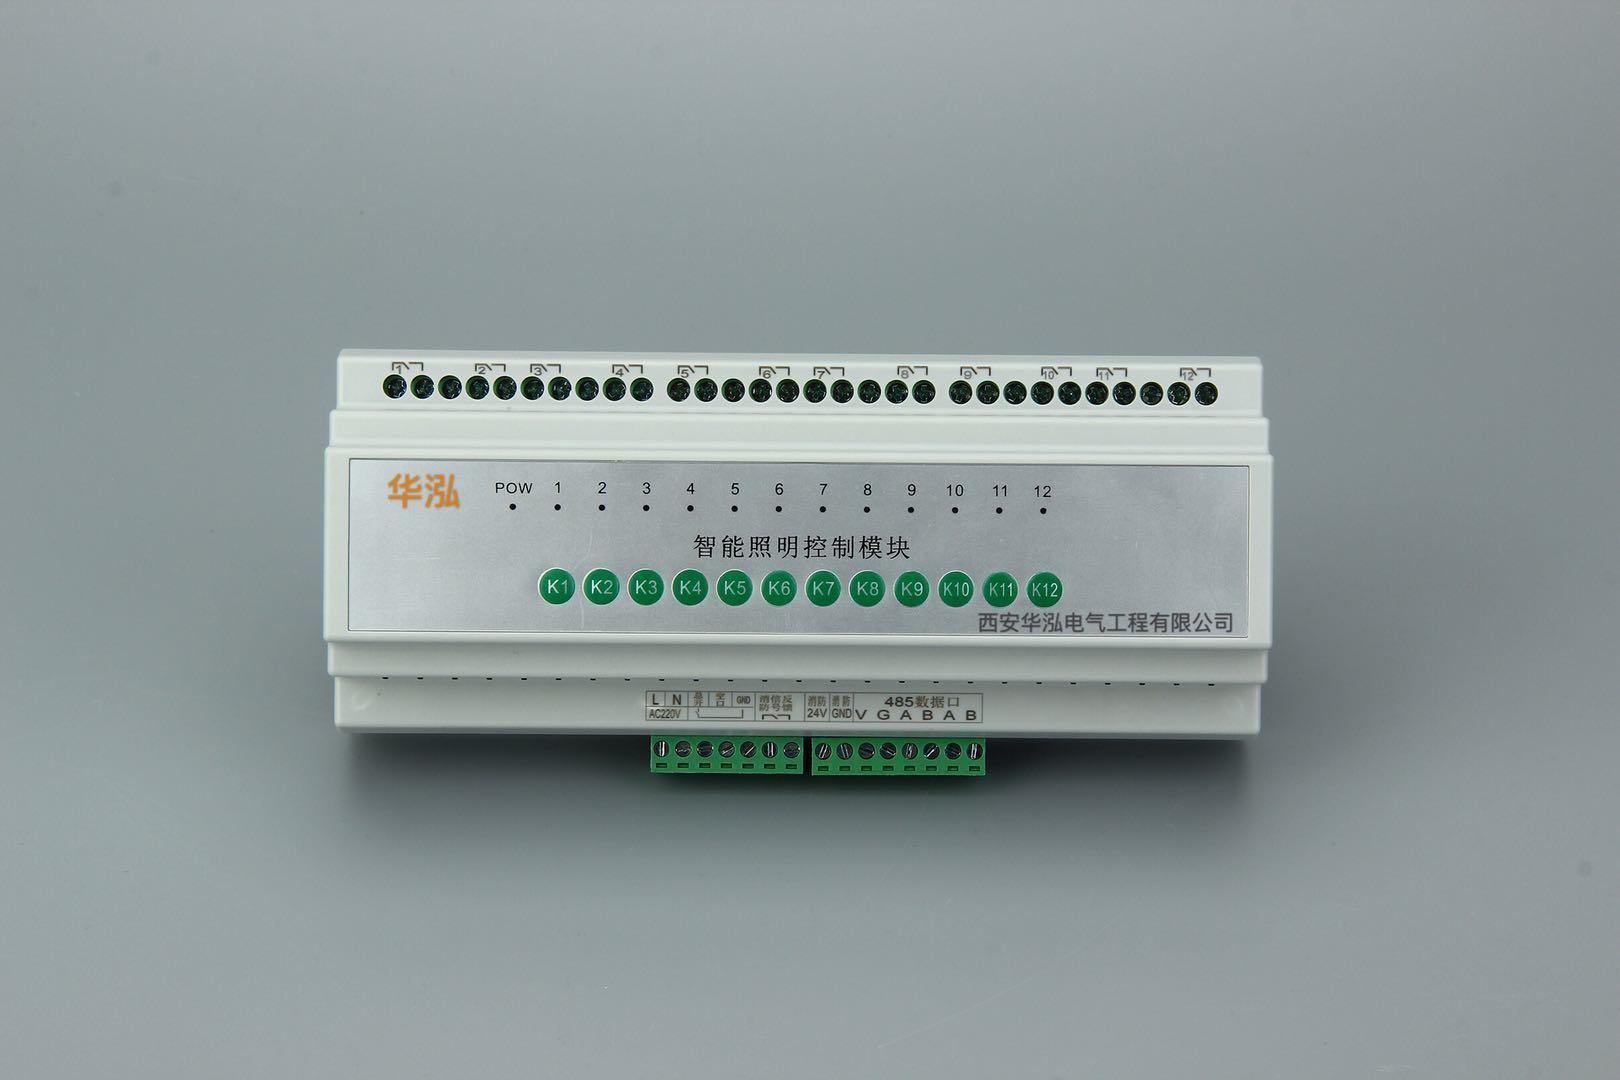 AJT-RM0816A智能照明模块智能继电器模块华泓